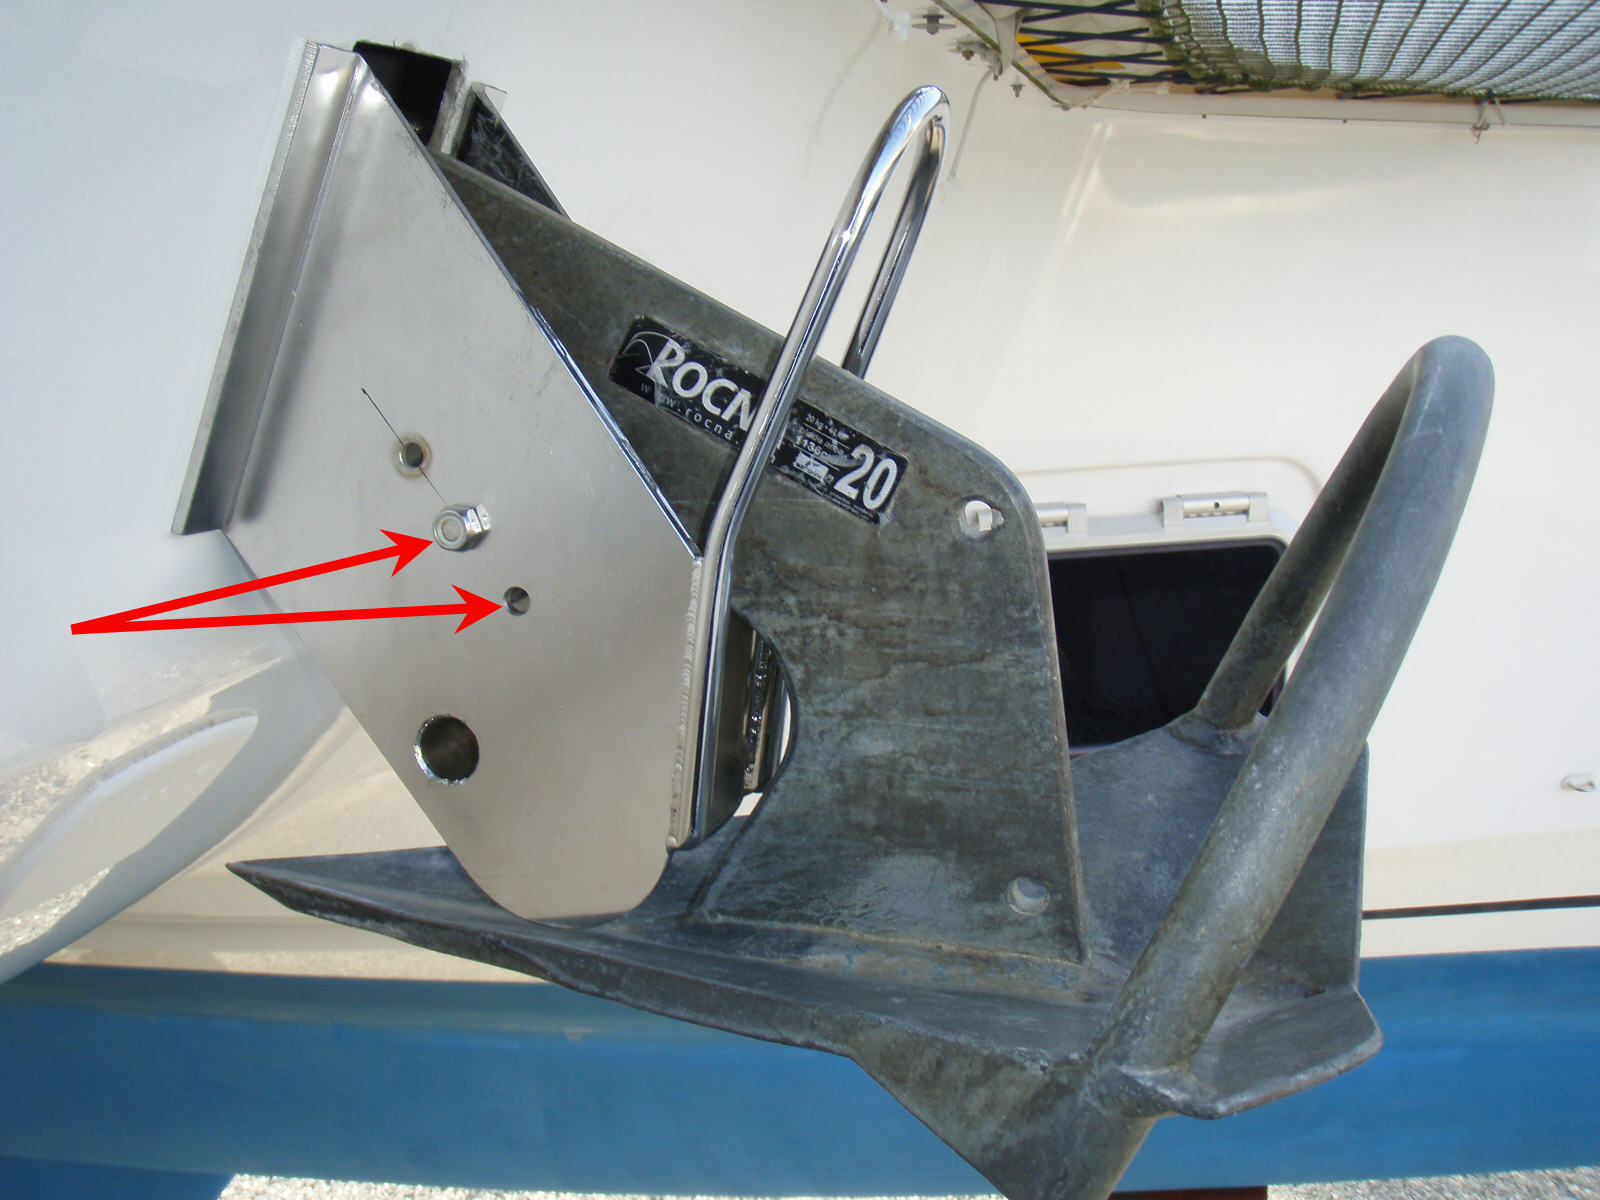 Click image for larger version  Name:Mahe 36 Anchor Davit adjustment.jpg Views:62 Size:206.7 KB ID:55980